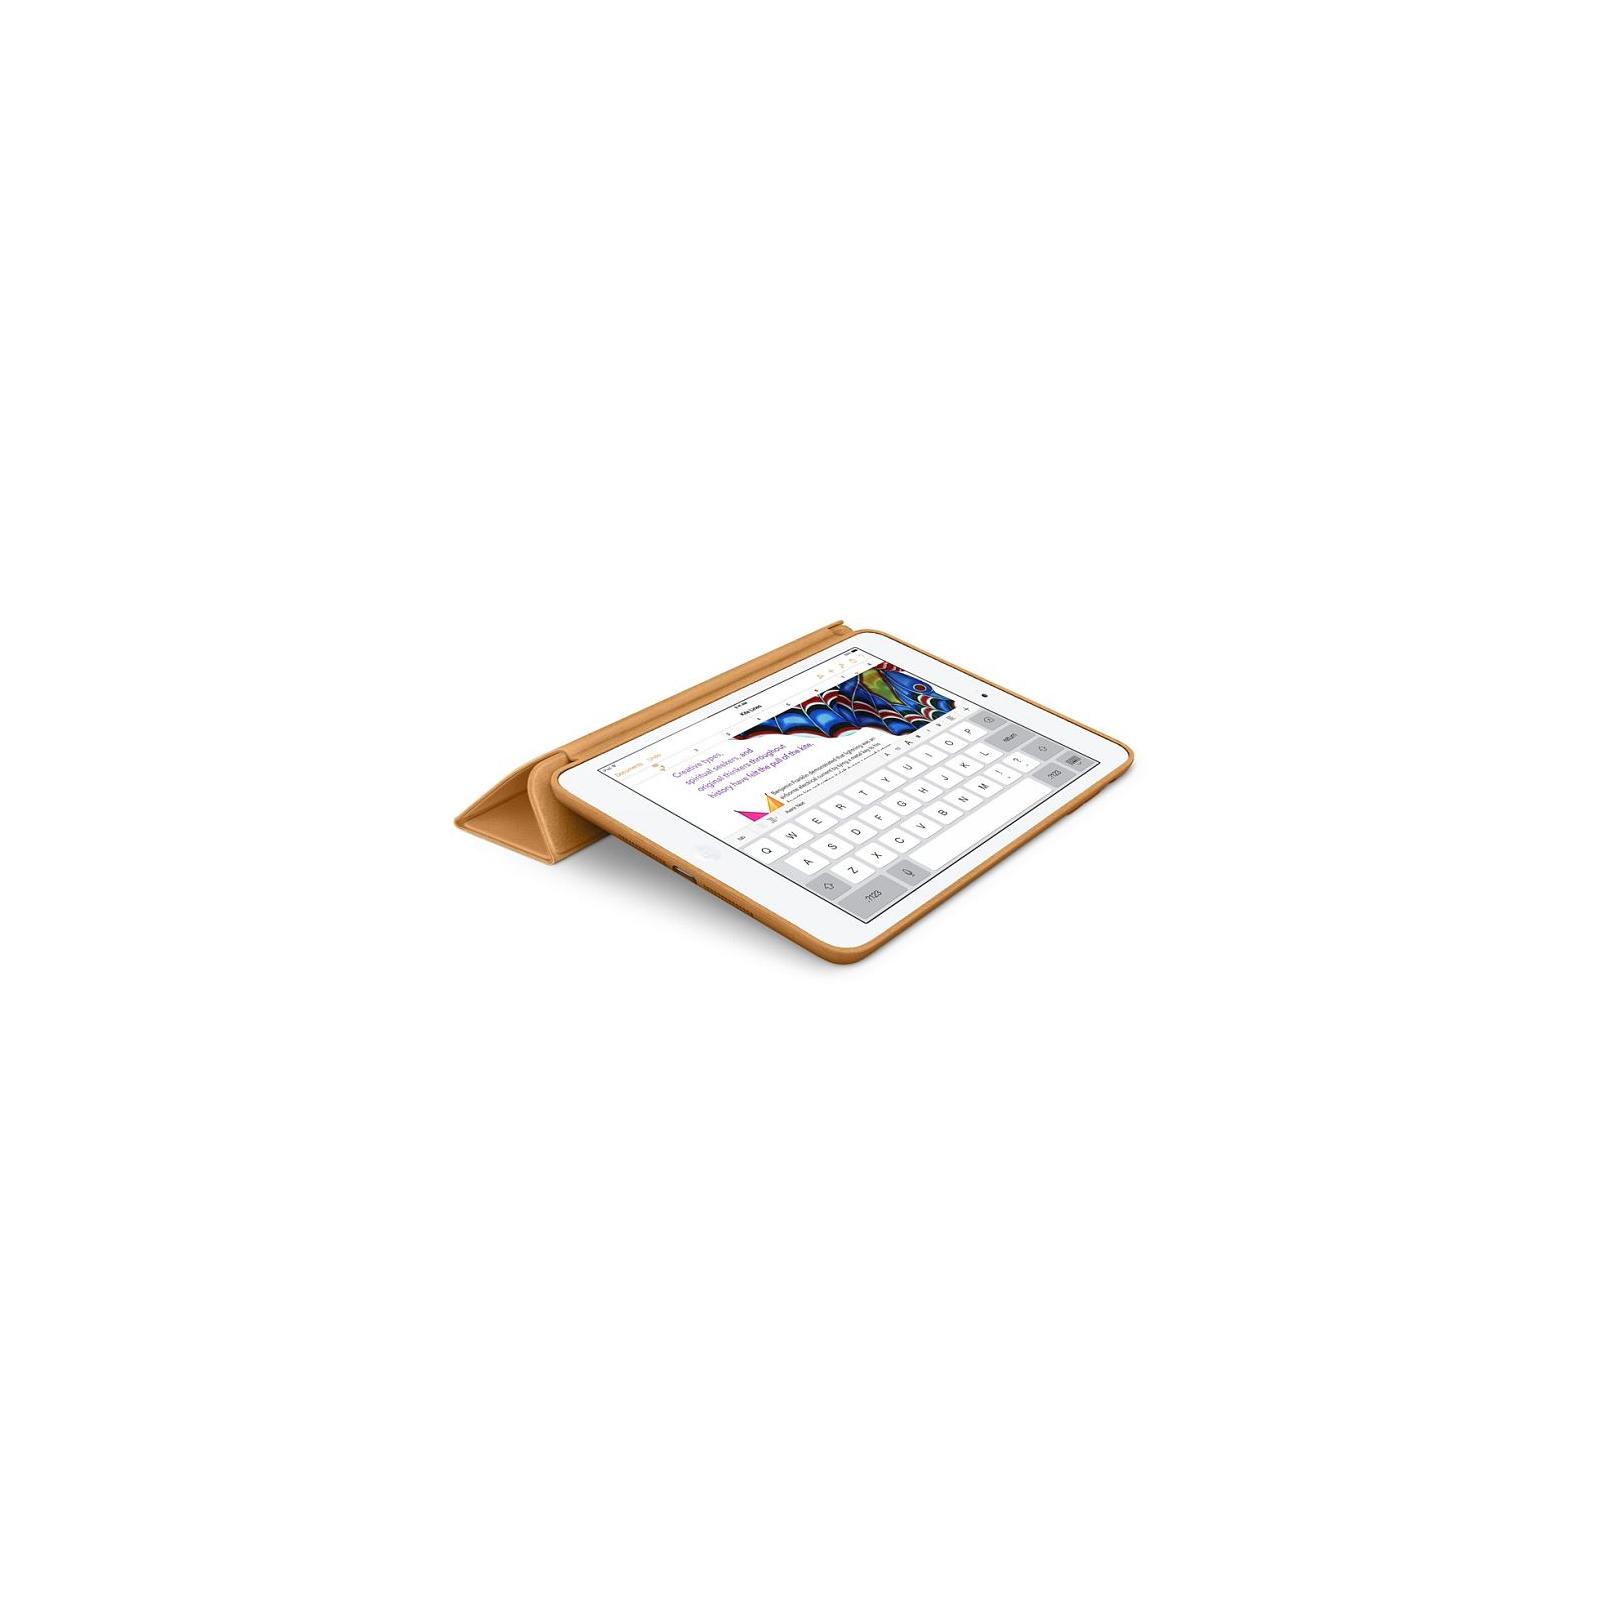 Чехол для планшета Apple Smart Case для iPad mini /brown (ME706ZM/A) изображение 4